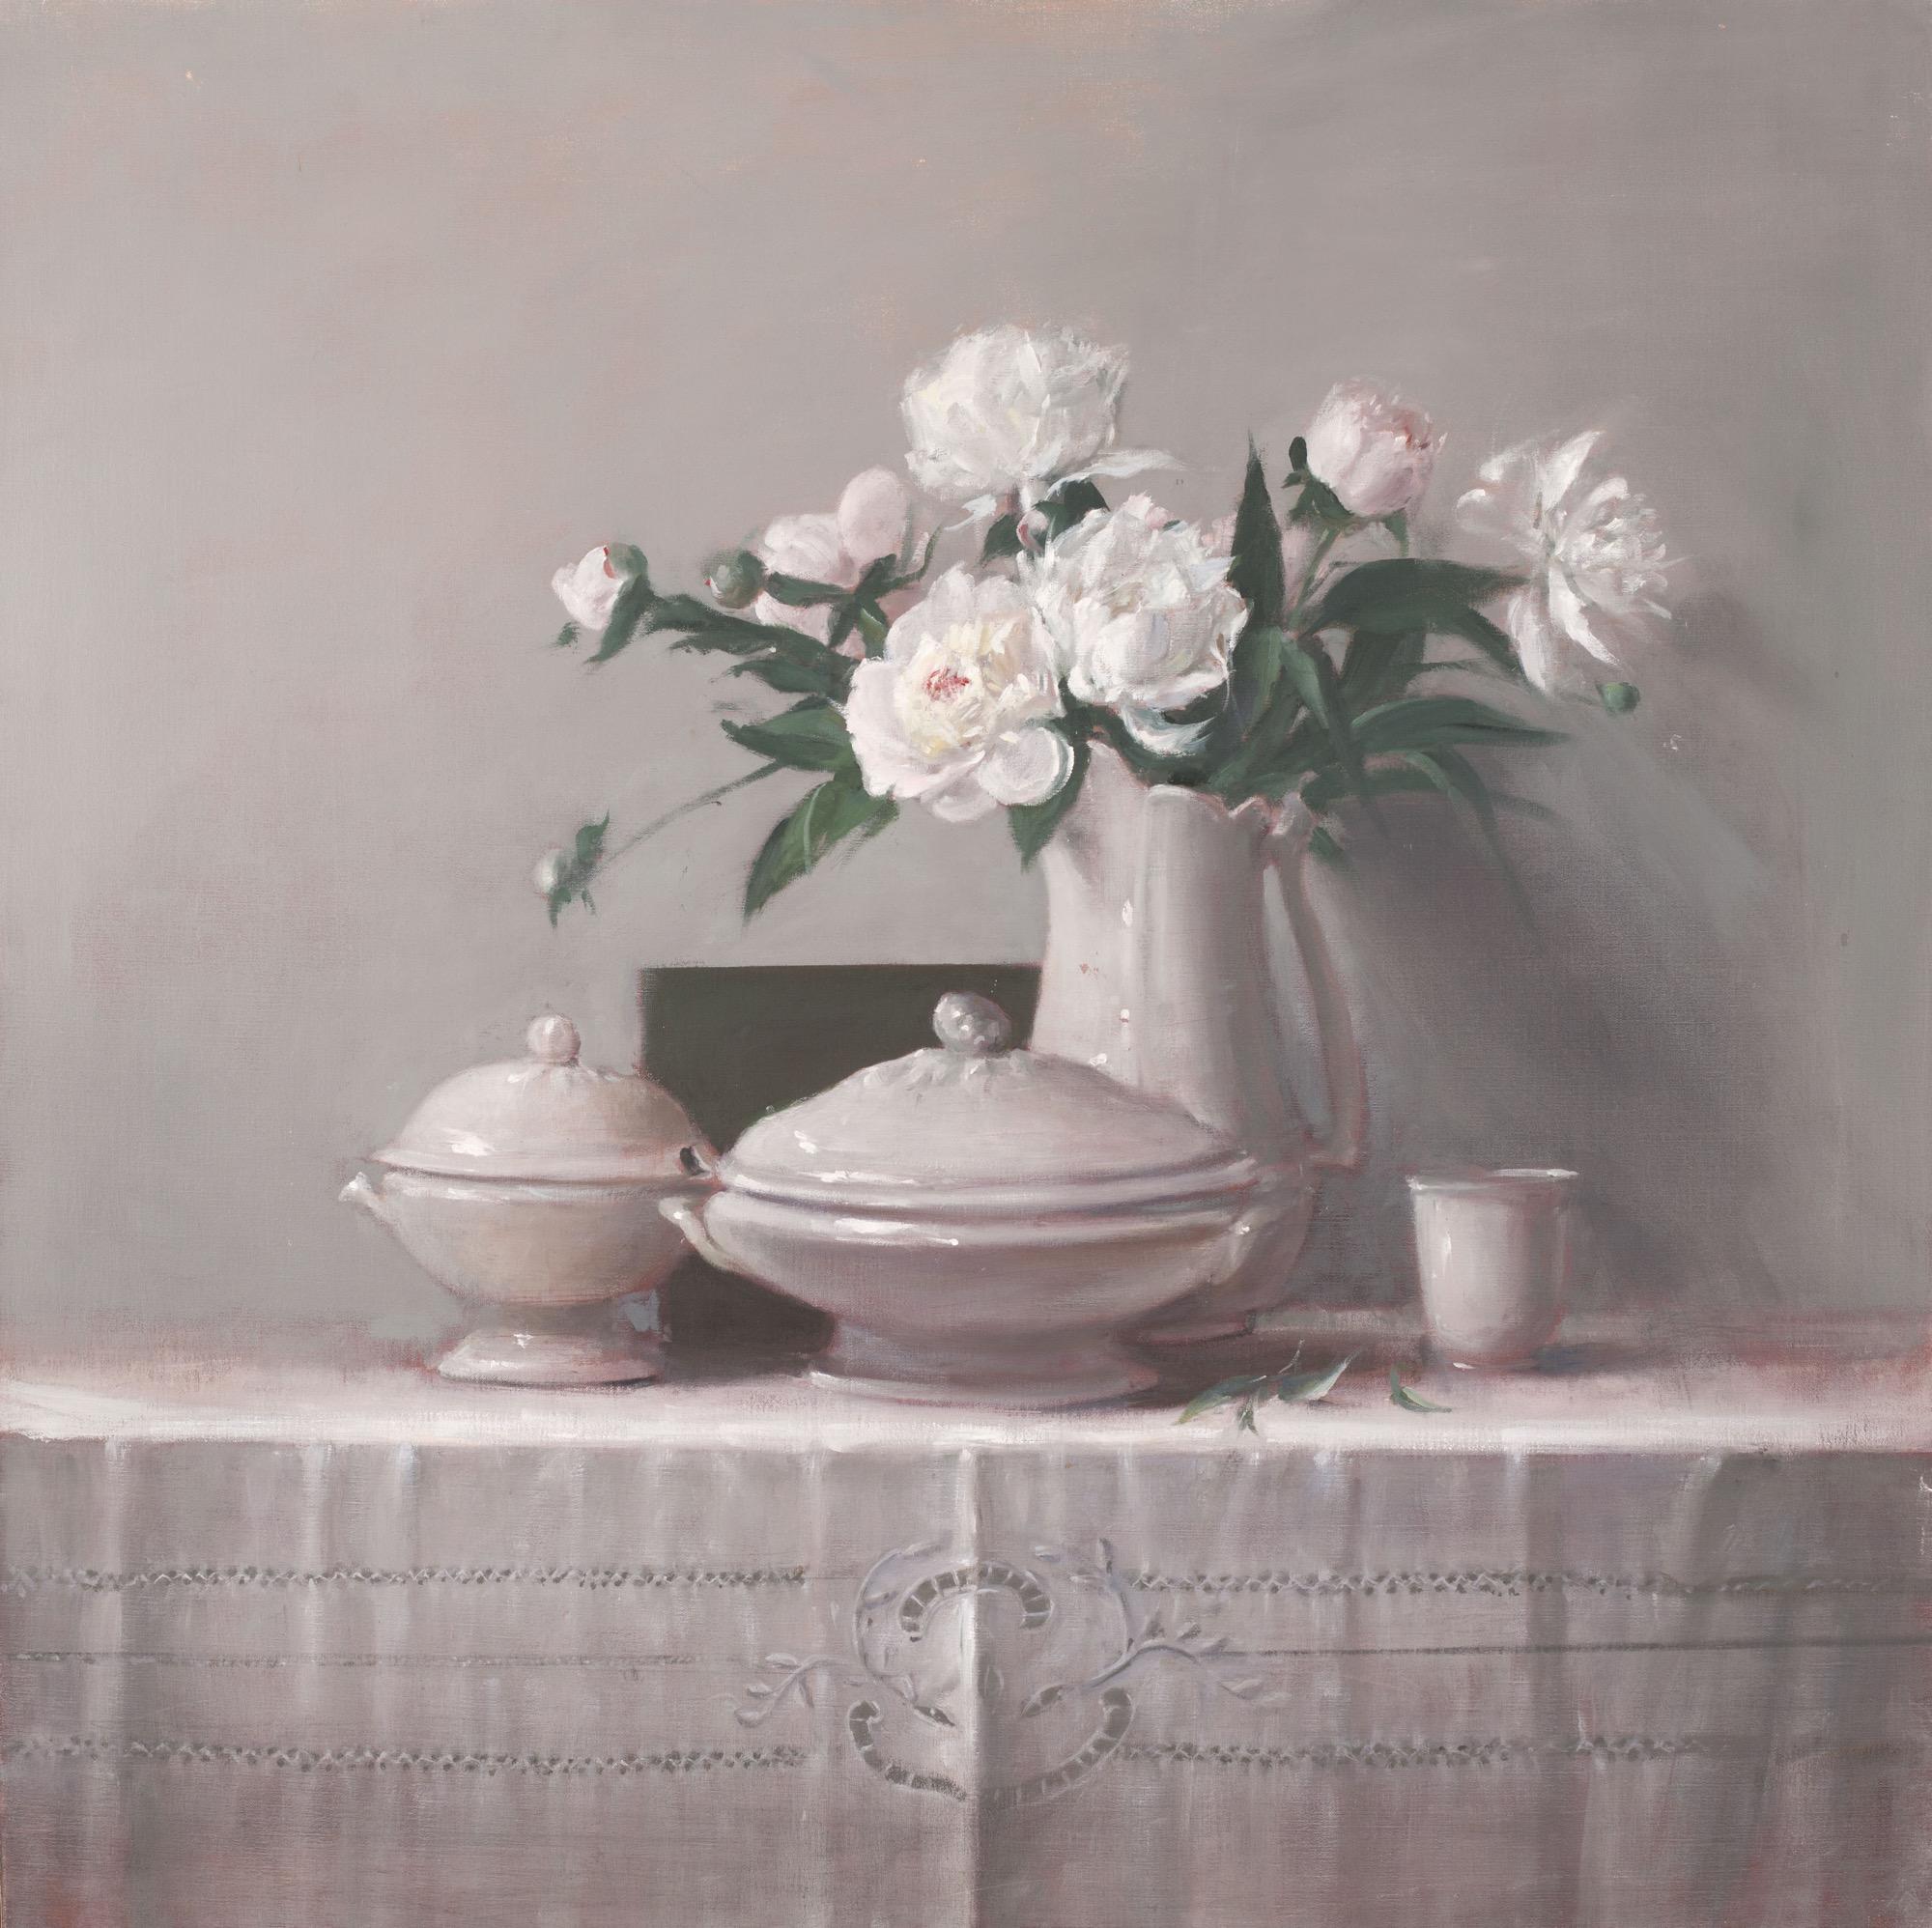 Raymond Han,  Peonies on Cut Clothwork , 2006, Oil on linen, 42 x 42 inches